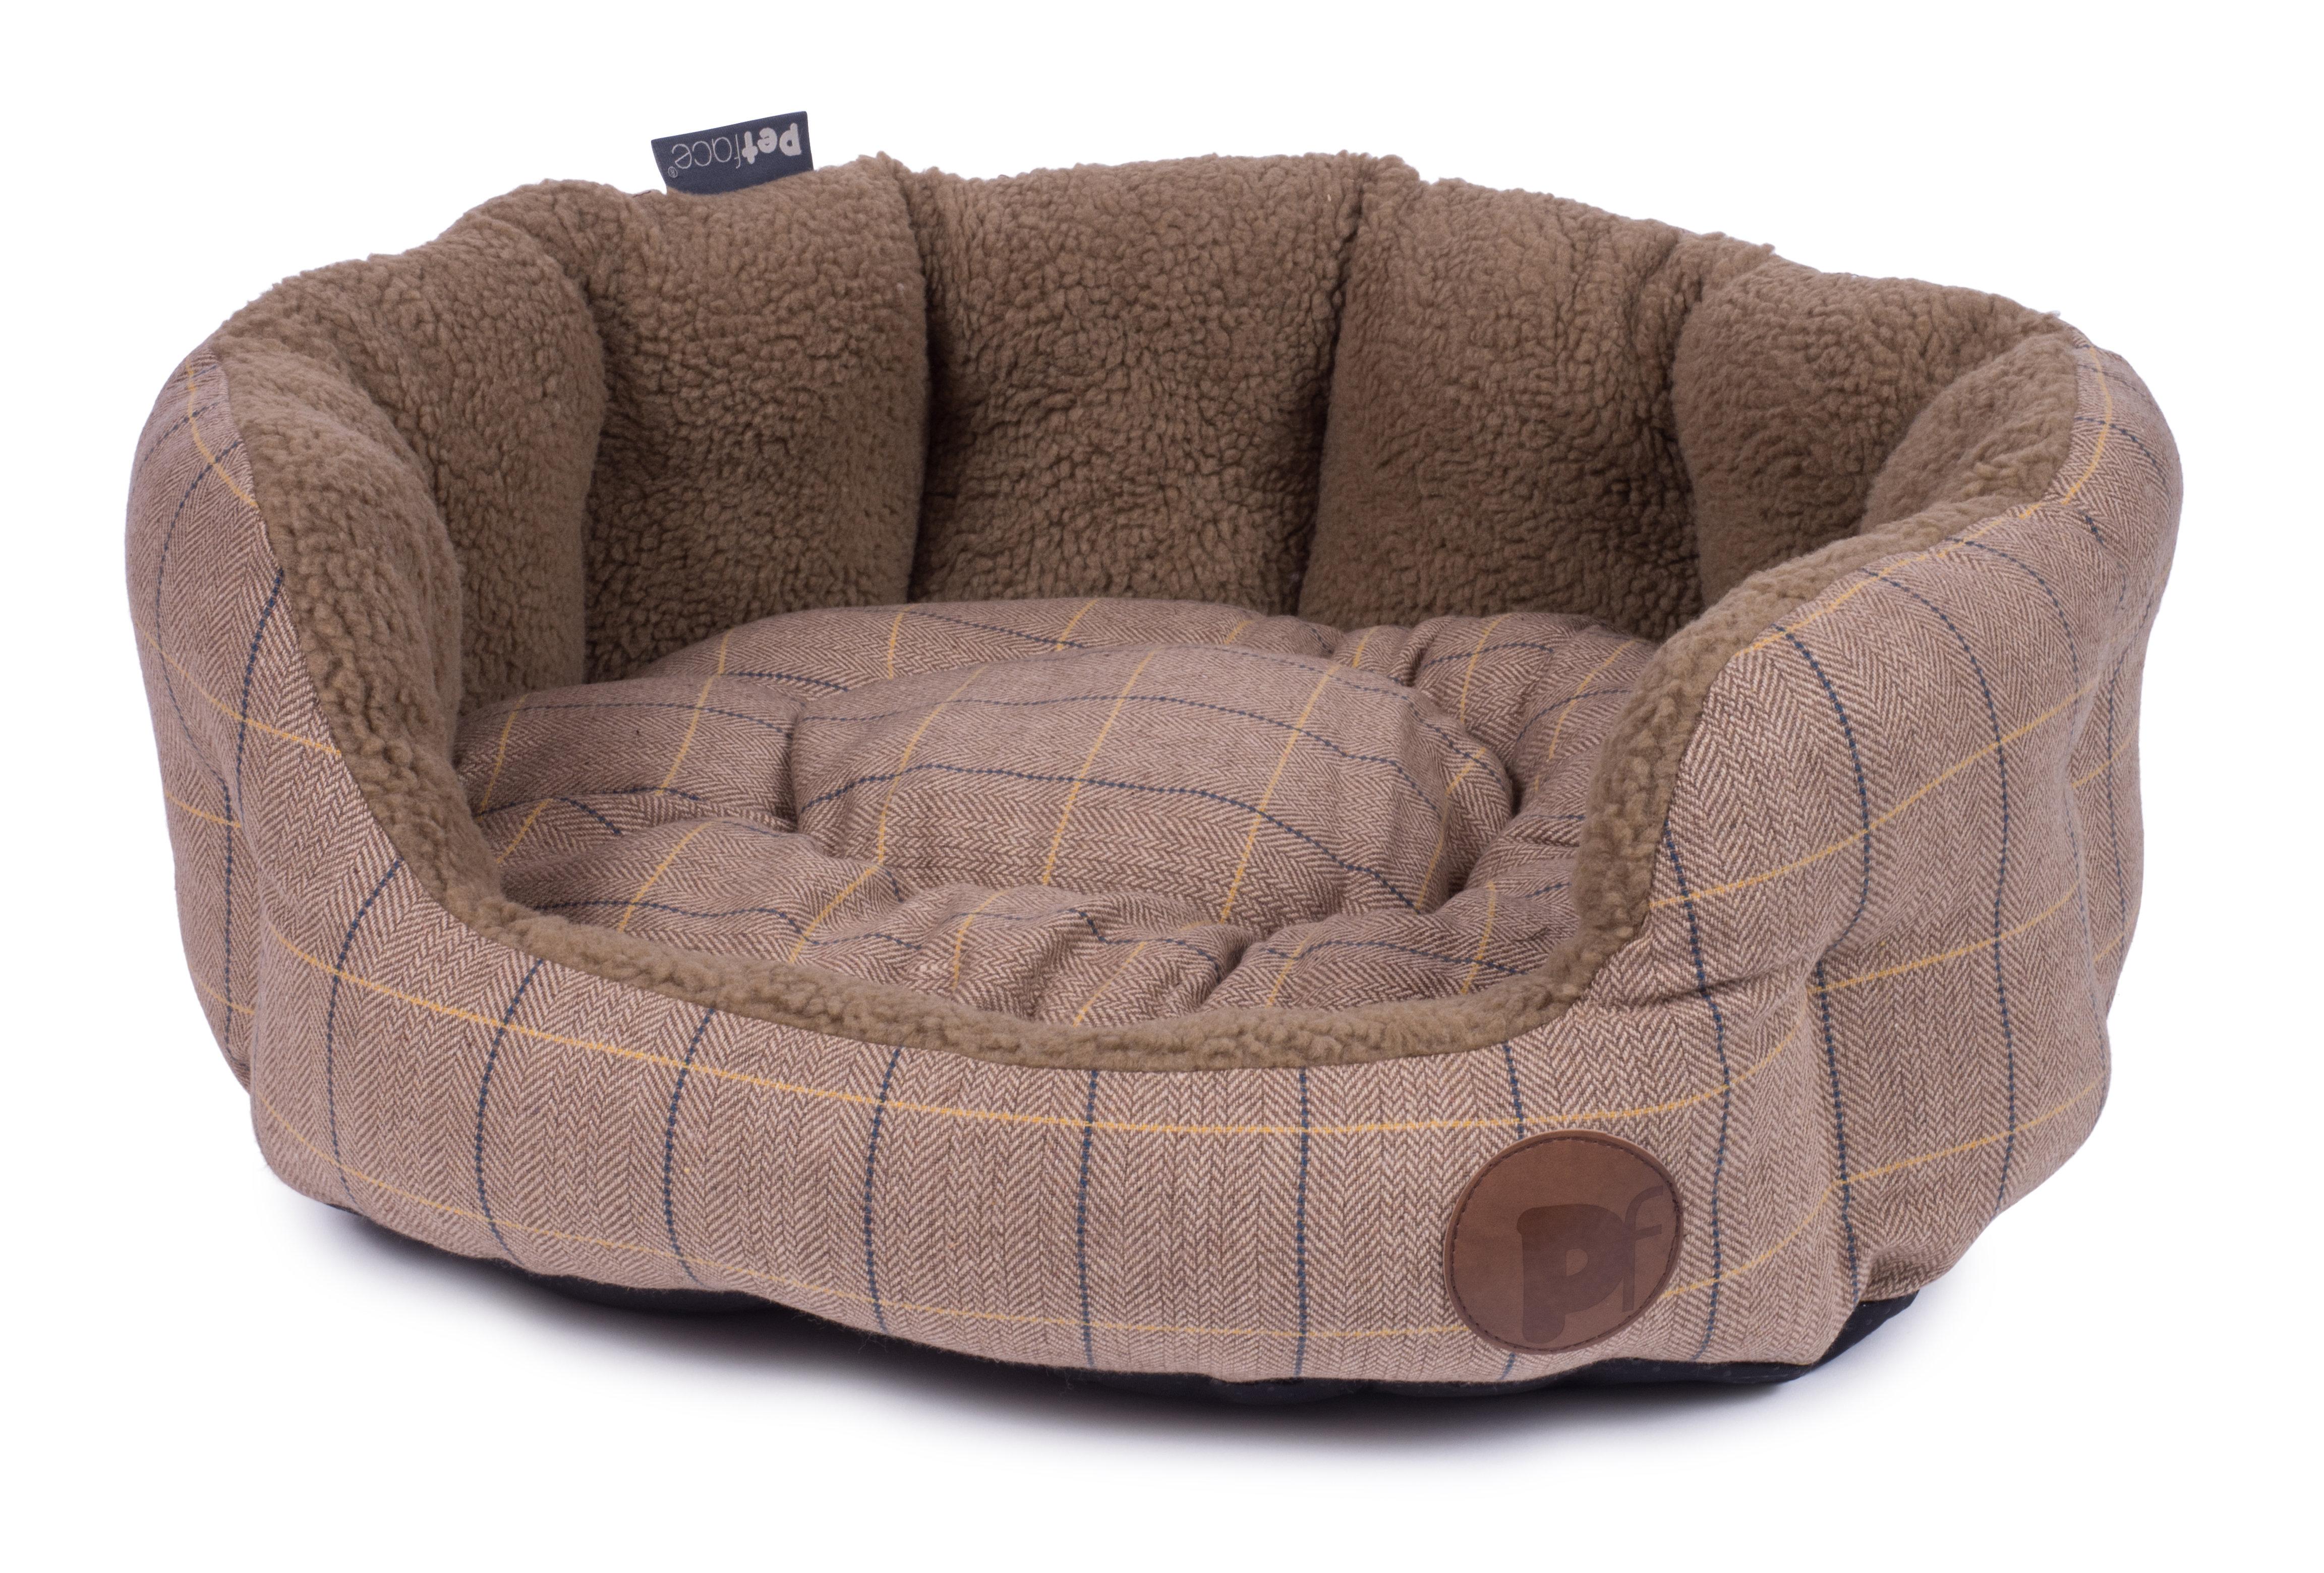 Tweed Oval Dog Bed Tan Ingleby Pet